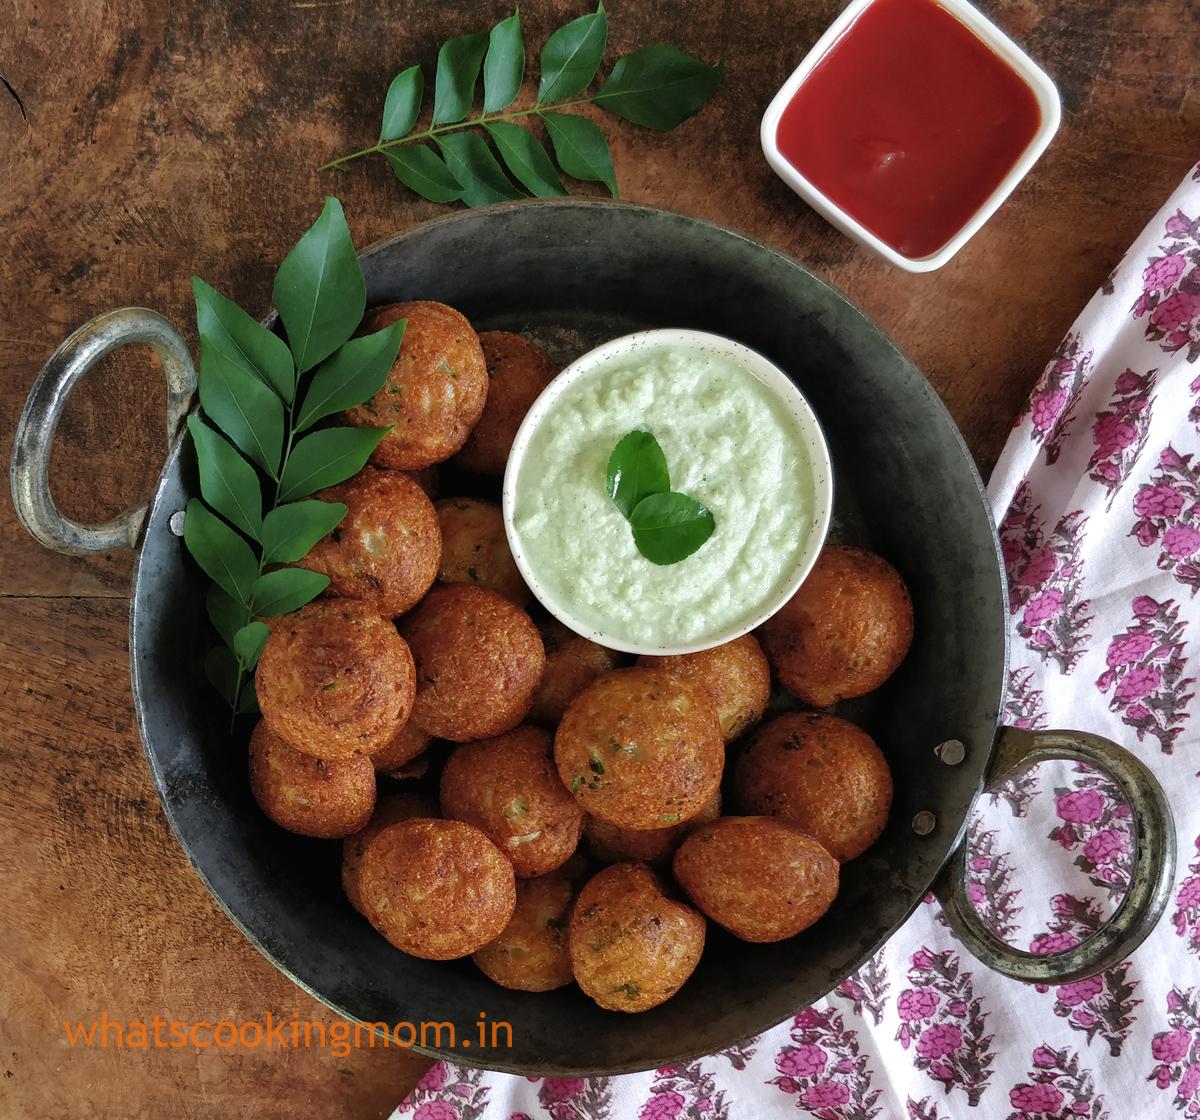 Instant Rava Appe/ appam/ paniyaram - quick, #healthy #vegetarian #snack #suji #semolina